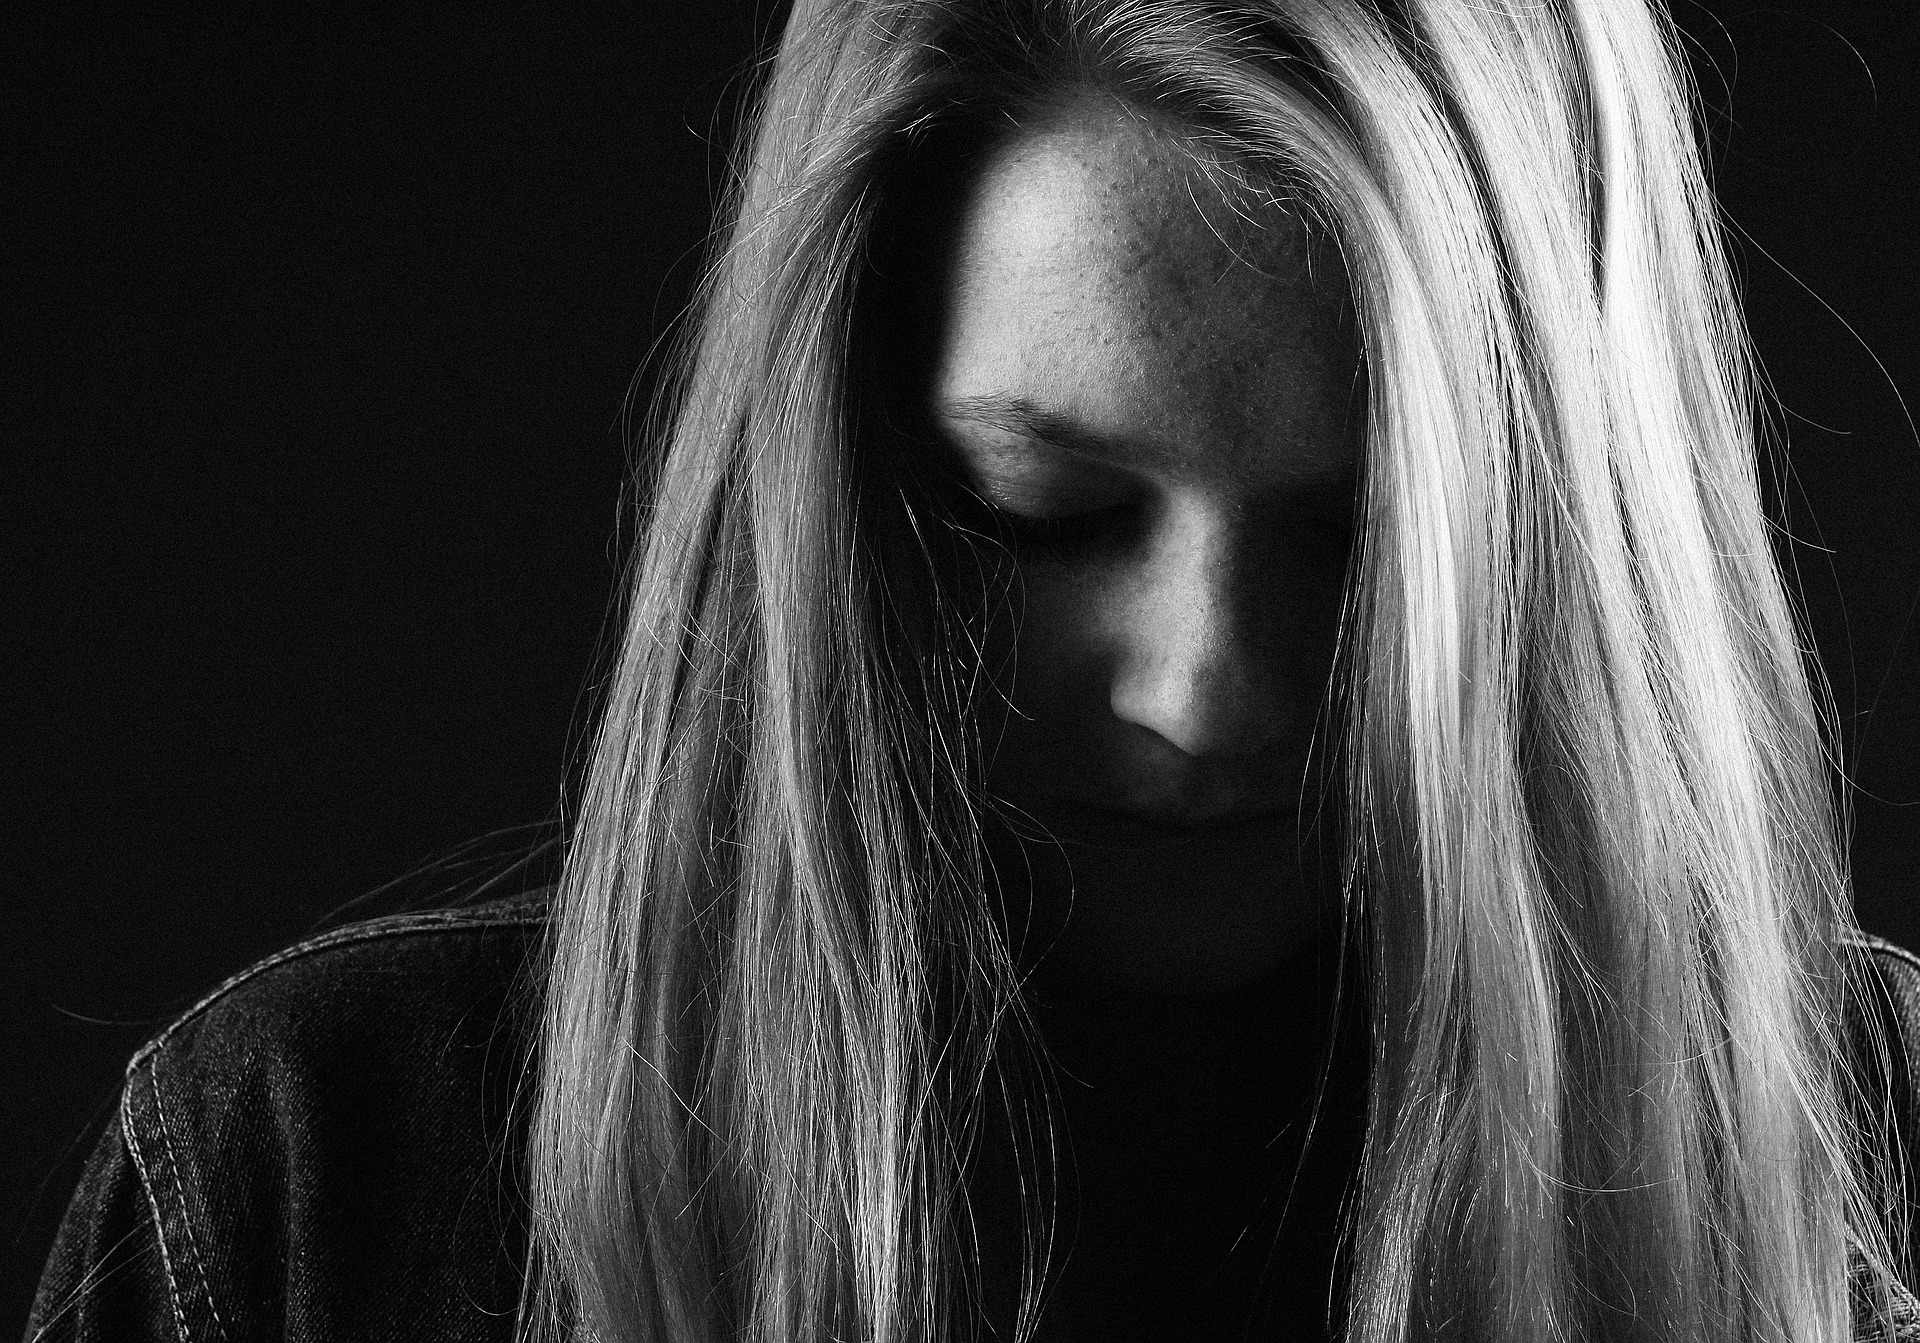 sad-girl-blonde-black-and-white